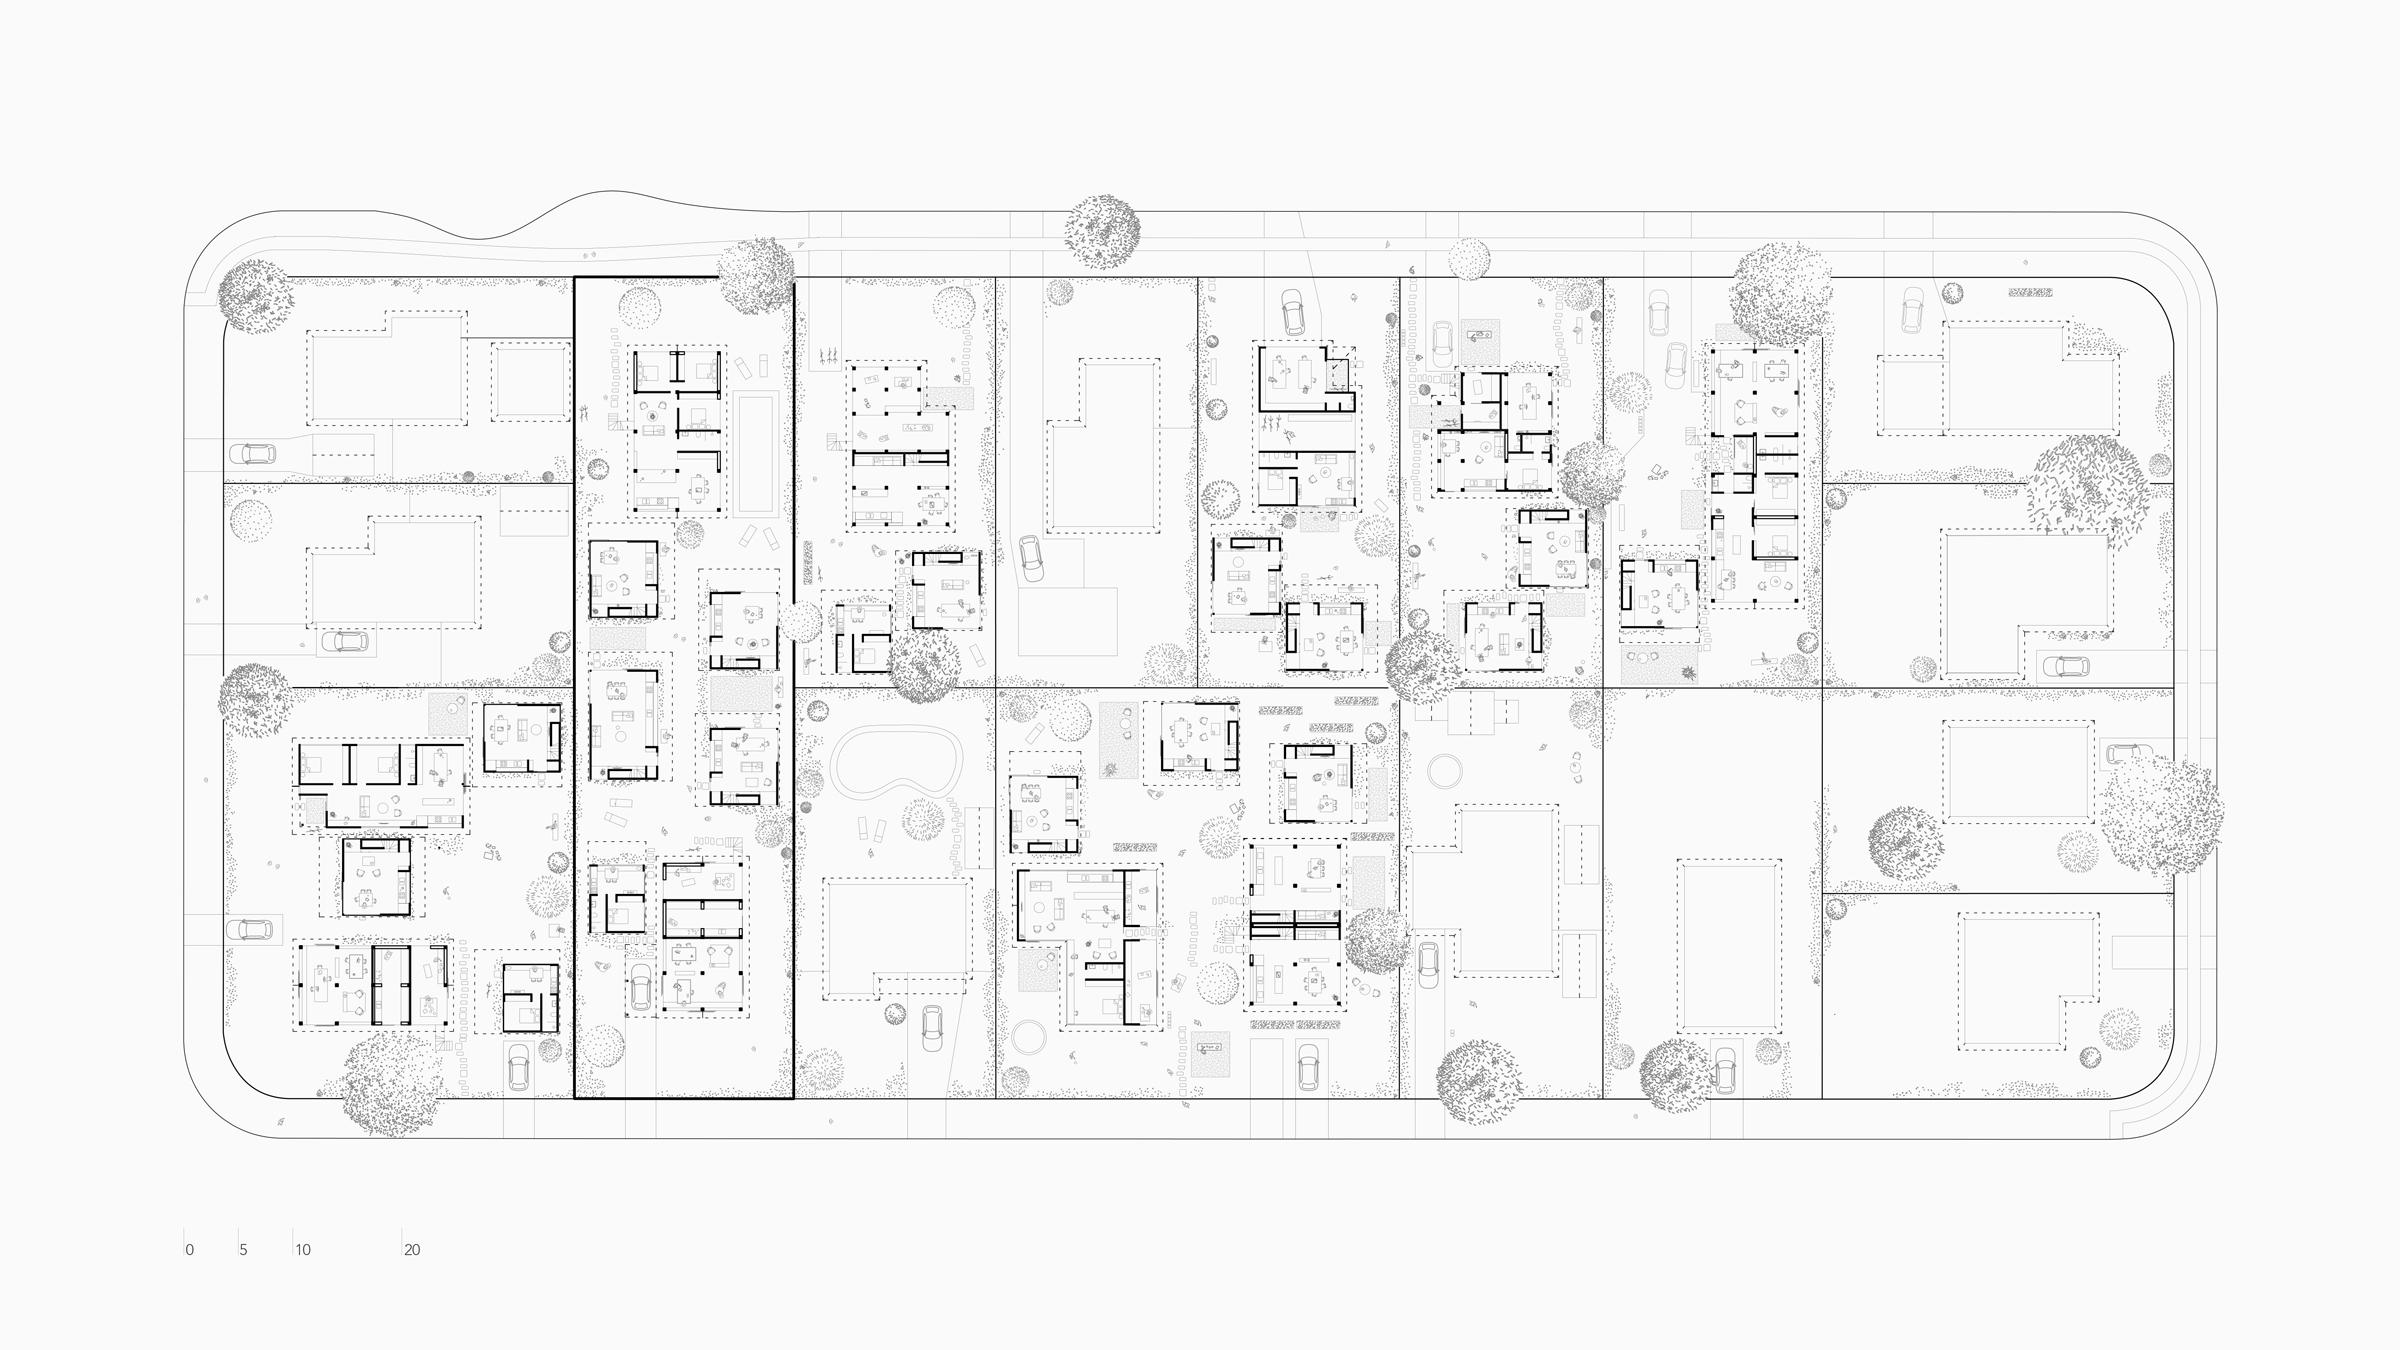 171212-Dappled-Dwellings-Site-Plan-Stage-06.jpg